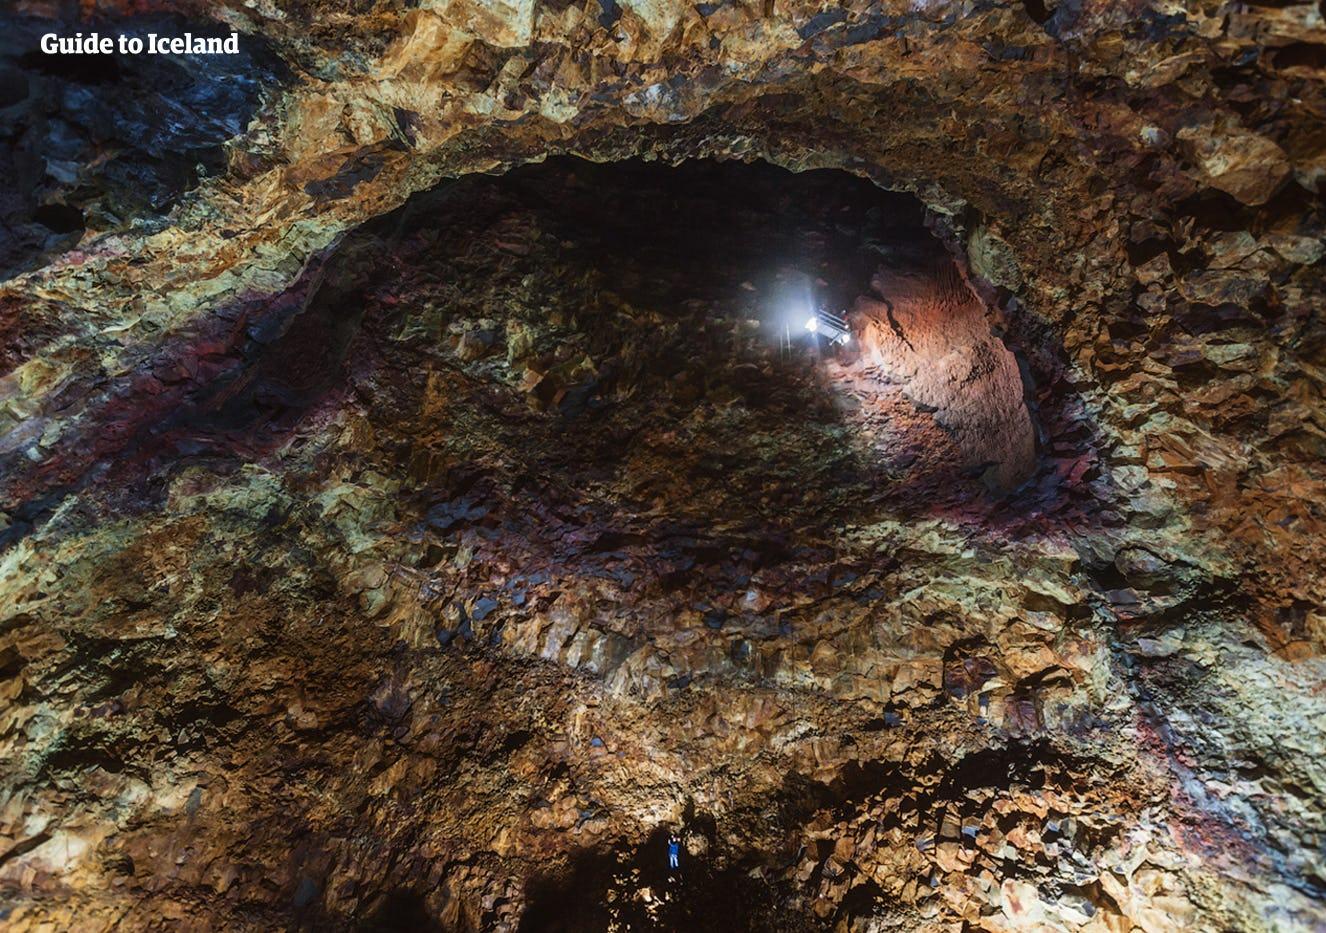 The dazzling colours seen inside of the Volcanic caldera, Þríhnúkagígur, defy the imagination with their deep shades of red, purple and blue.